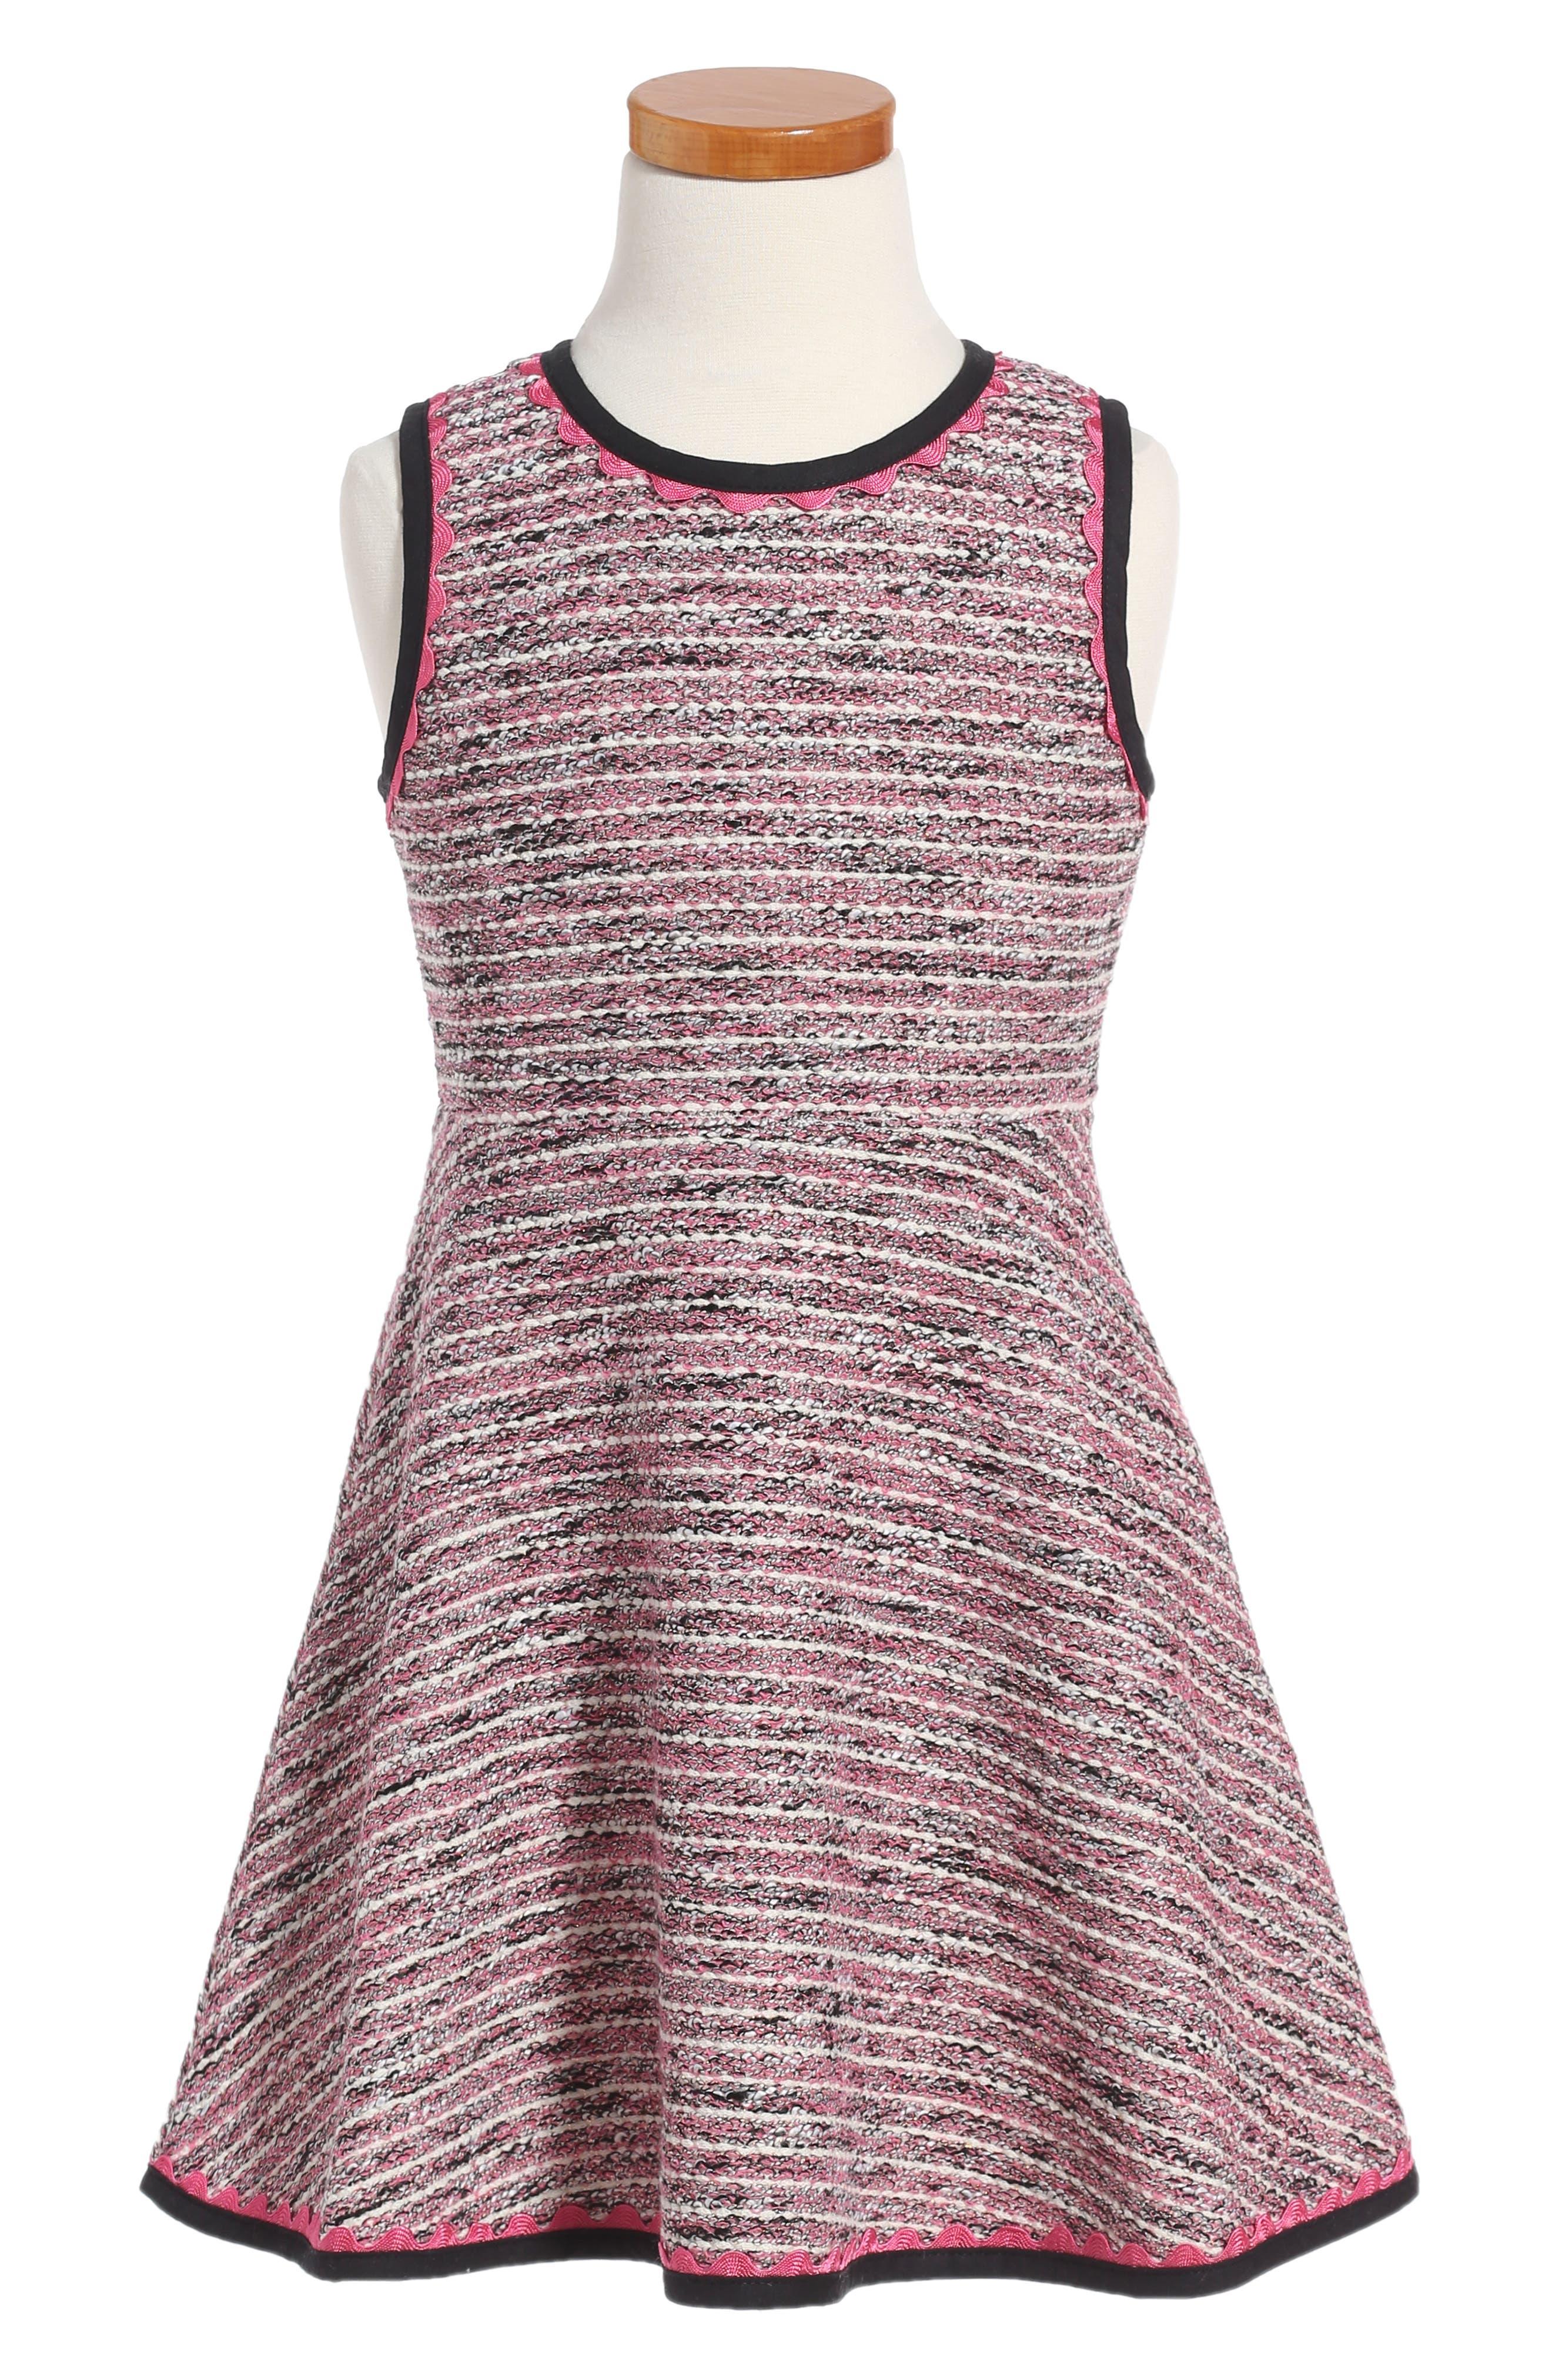 KATE SPADE NEW YORK tweed dress